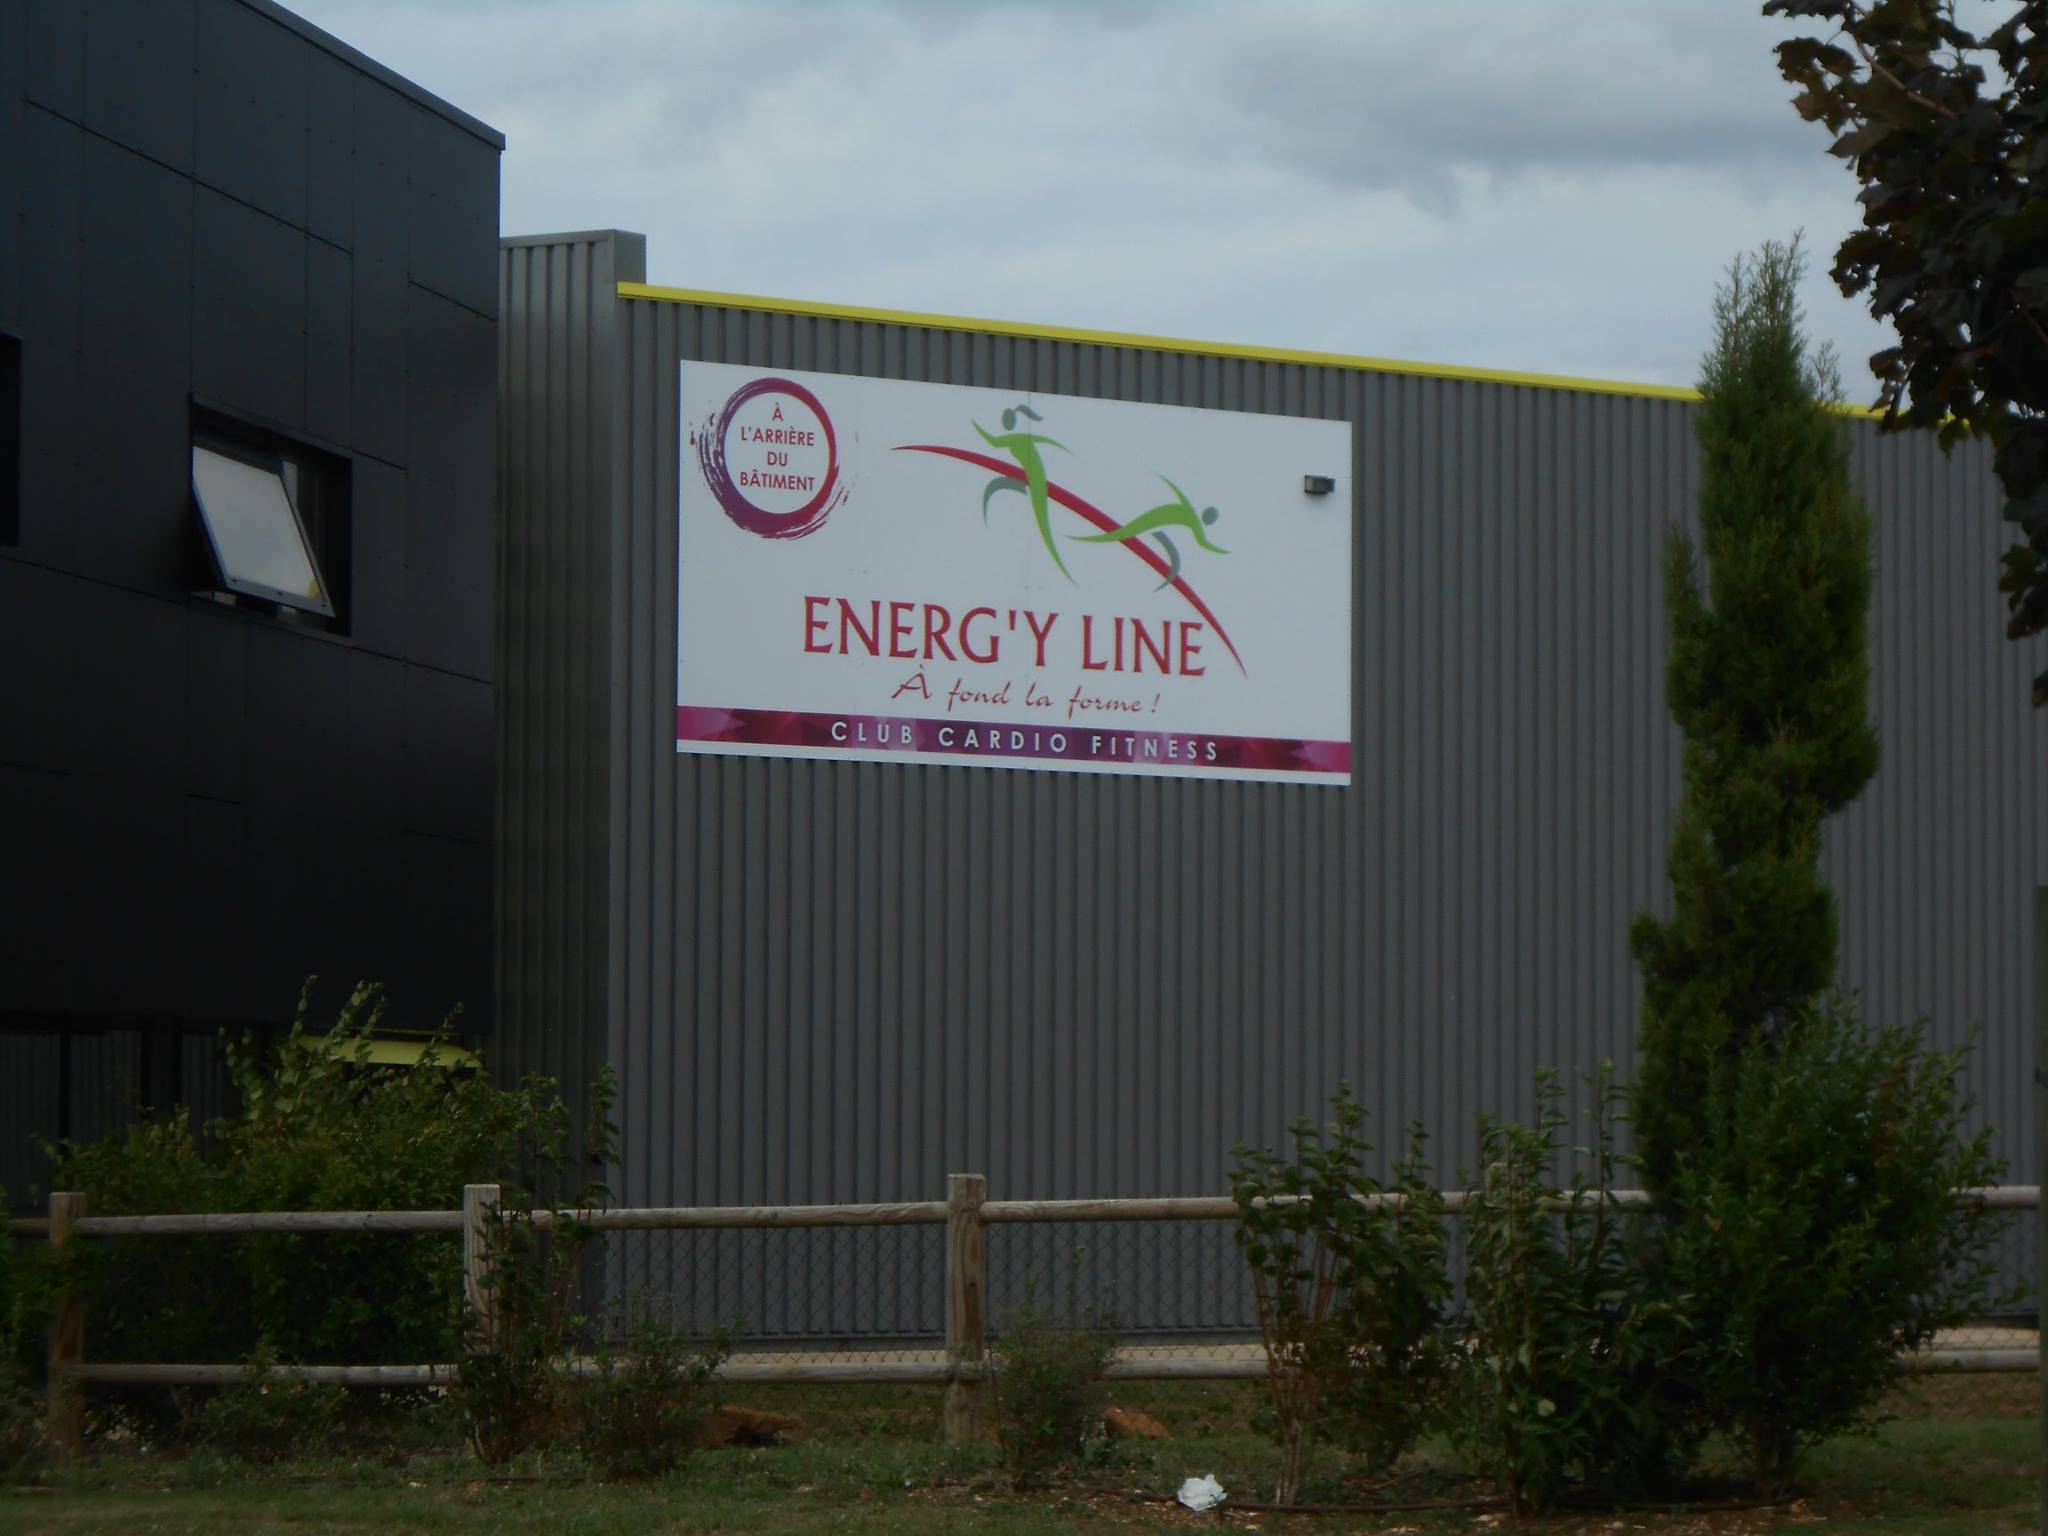 ENERG'Y LINE